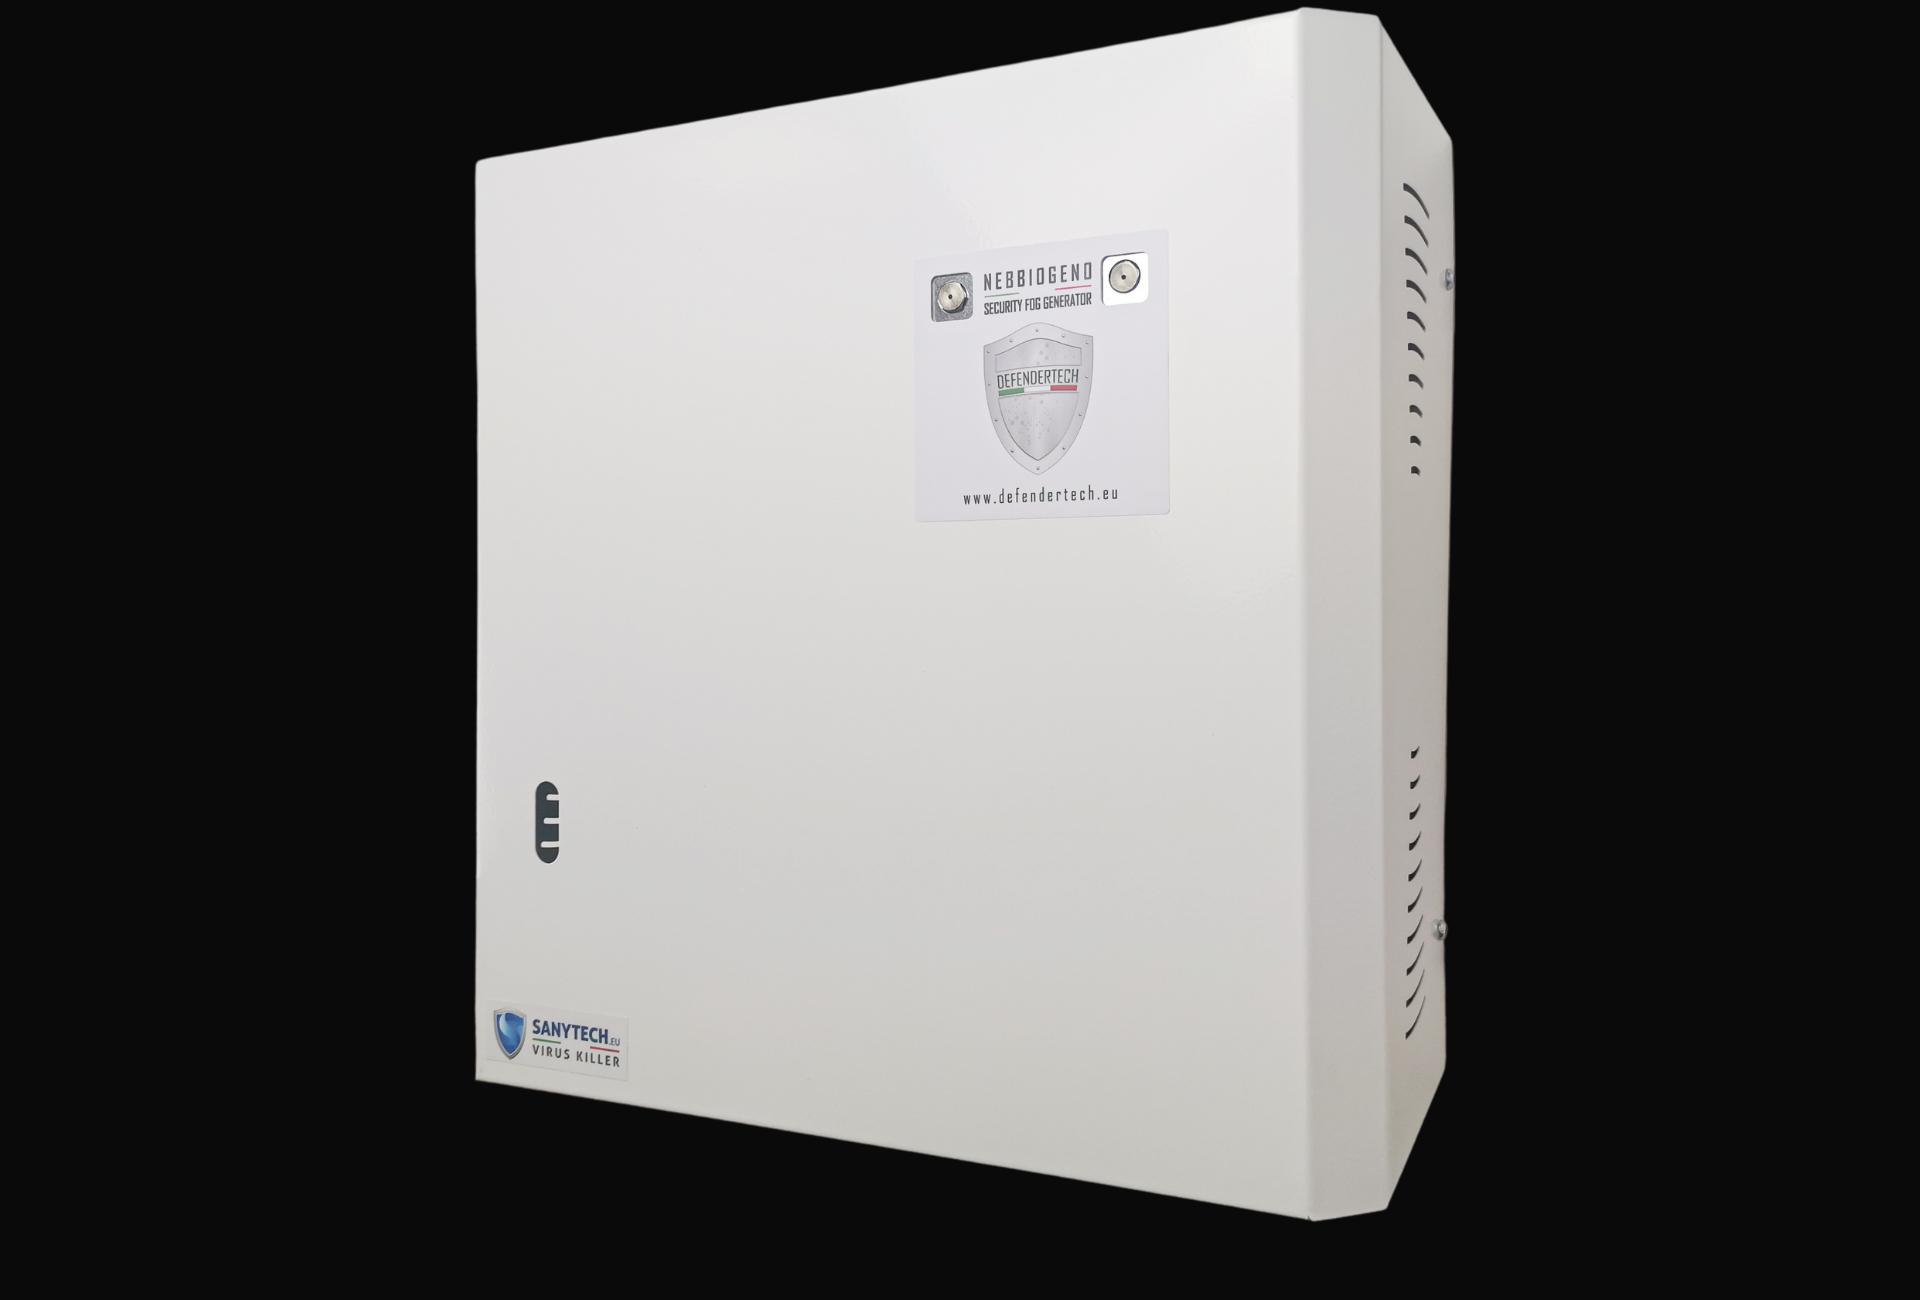 SX-200 sanificatore virucida battericida sanytech